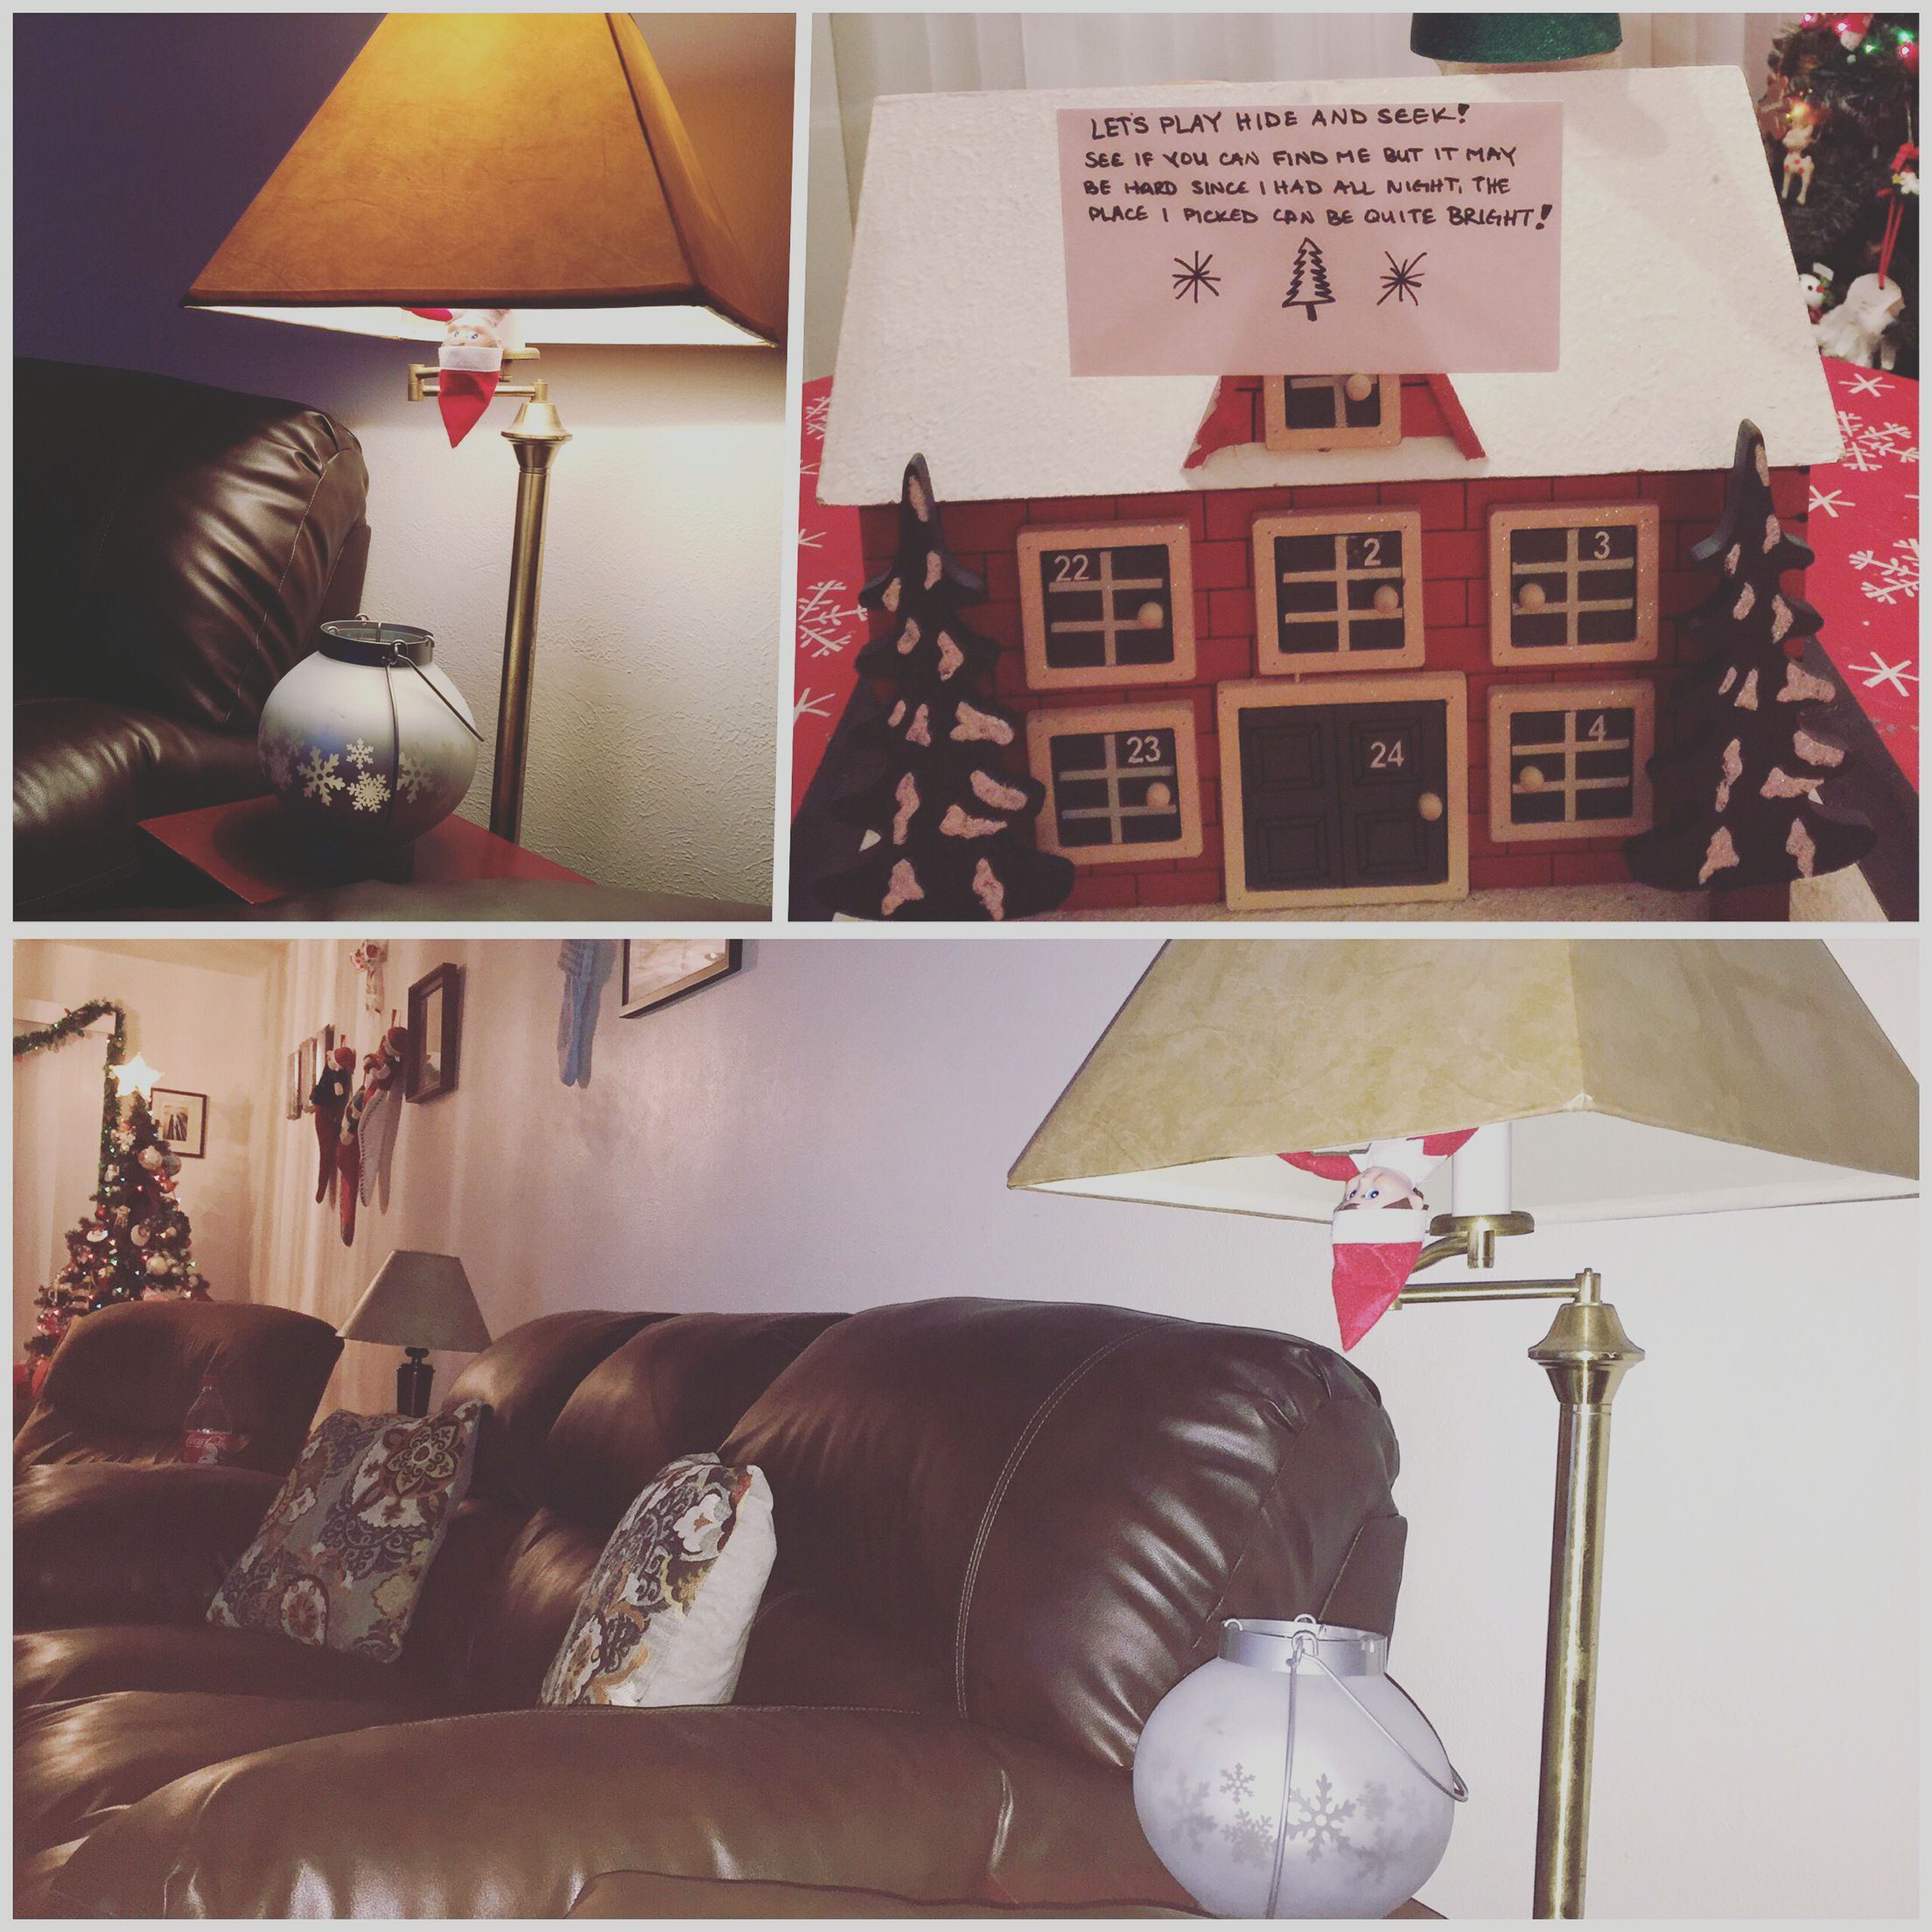 Elf on the shelf hide and seek Home decor, Shelves